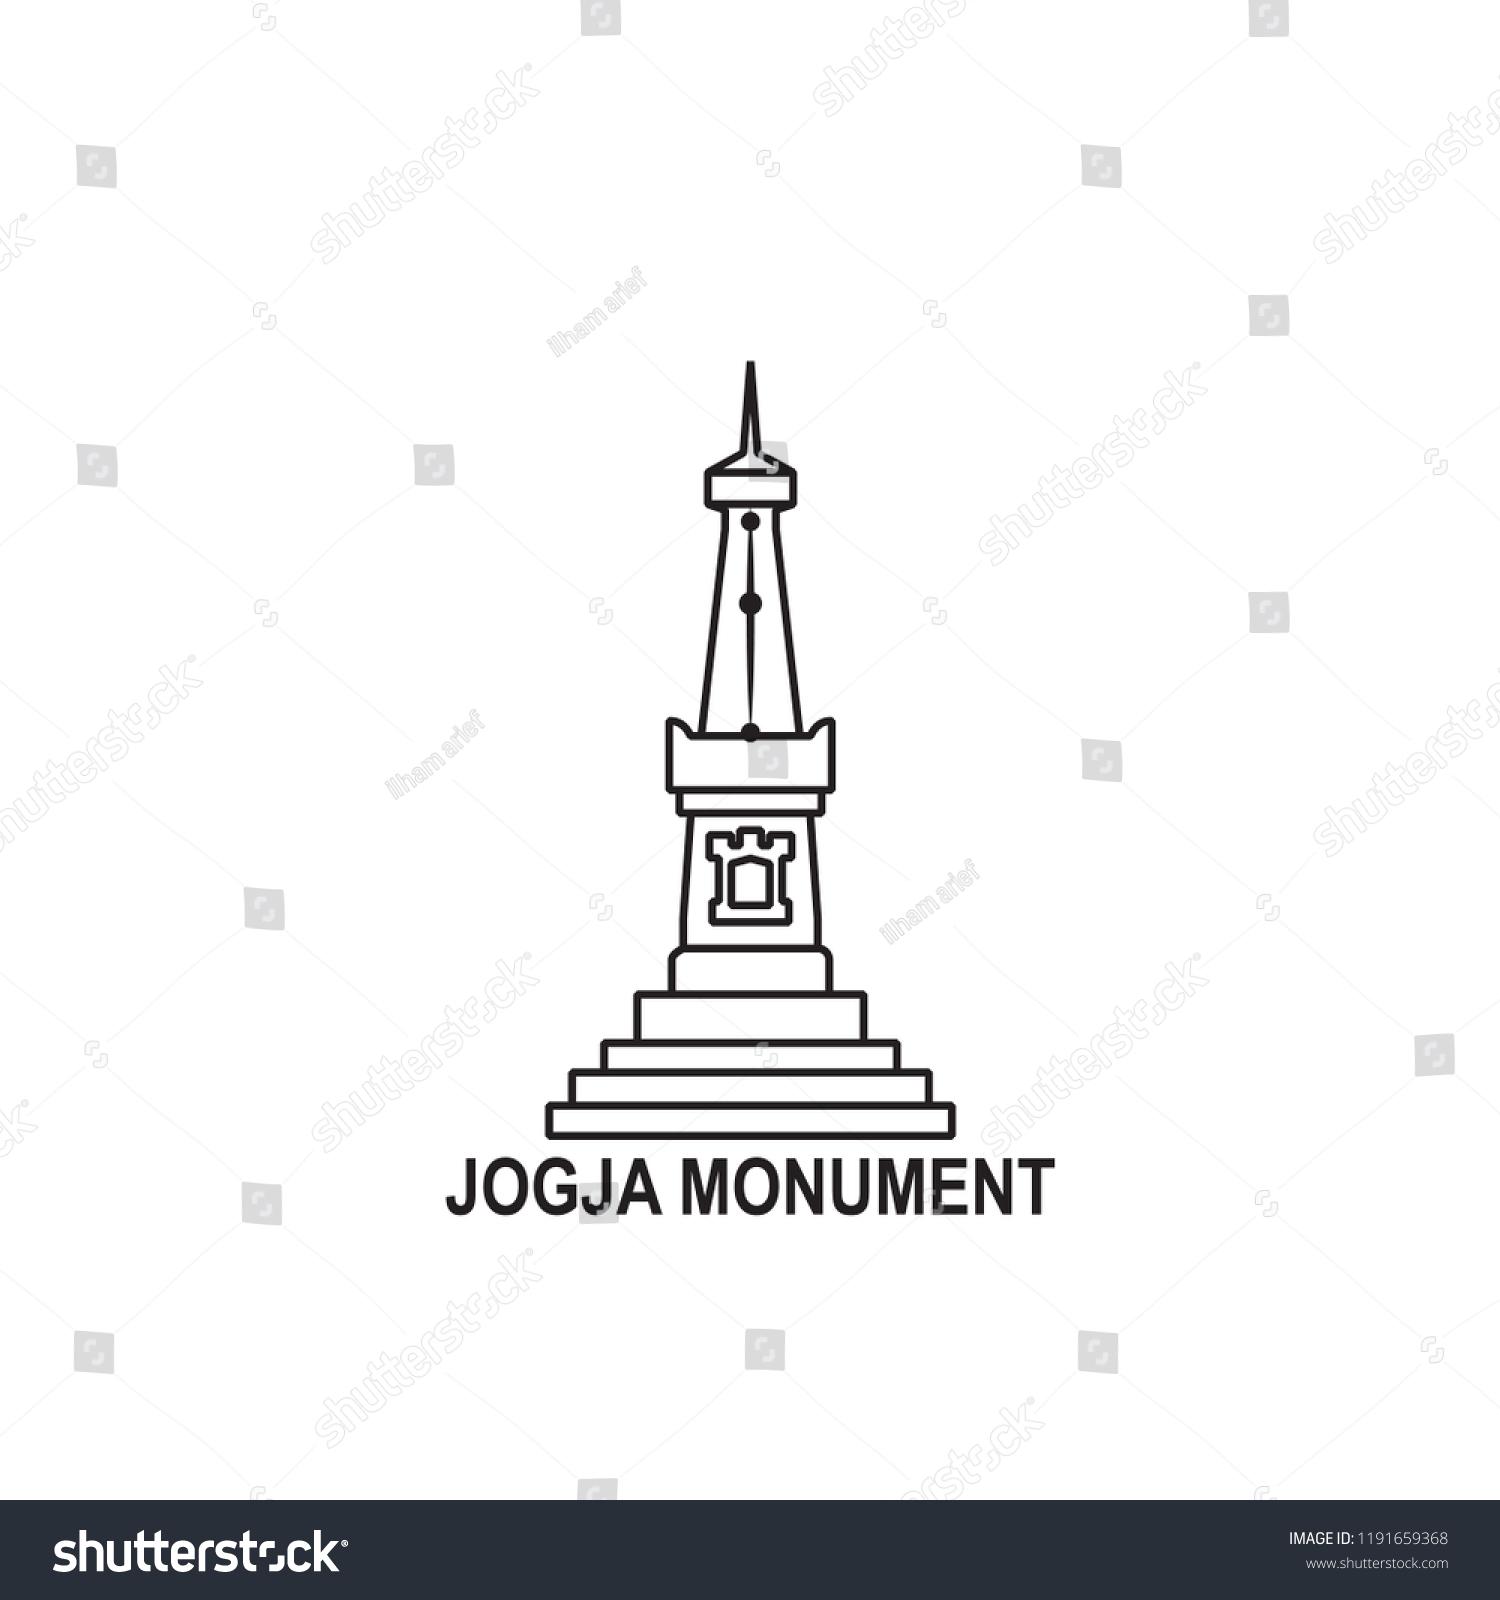 Tugu Jogja Icon Outline Stock Vector Royalty Free